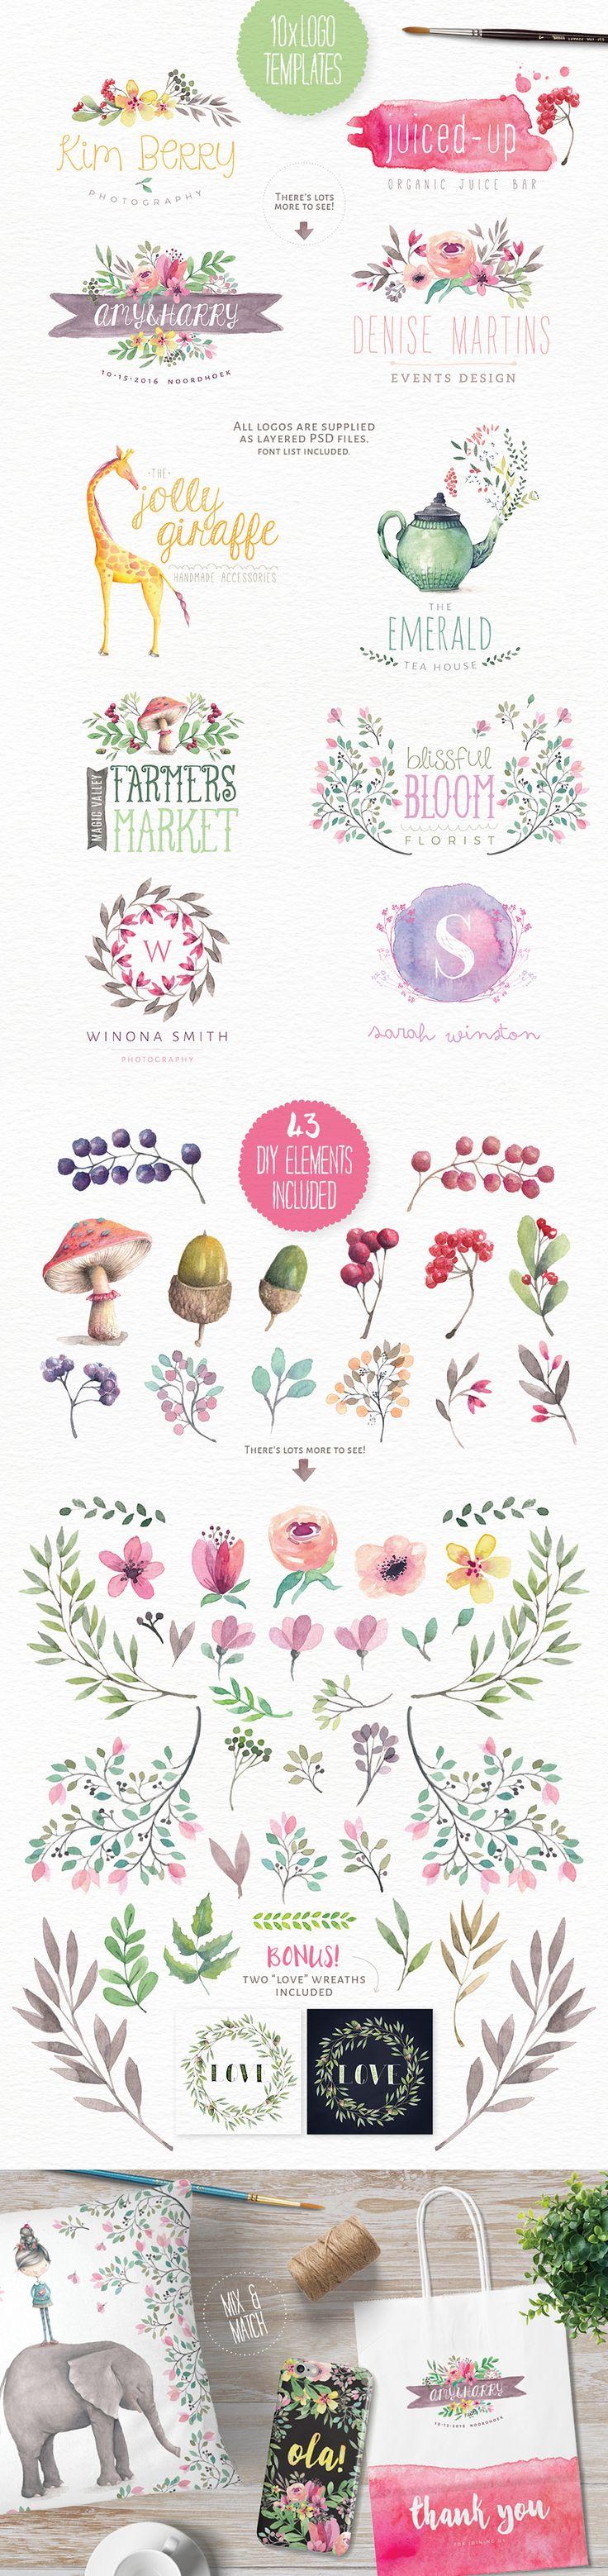 The Creative Designer's Complete Illustration Kit                                                                                                                                                                                 More